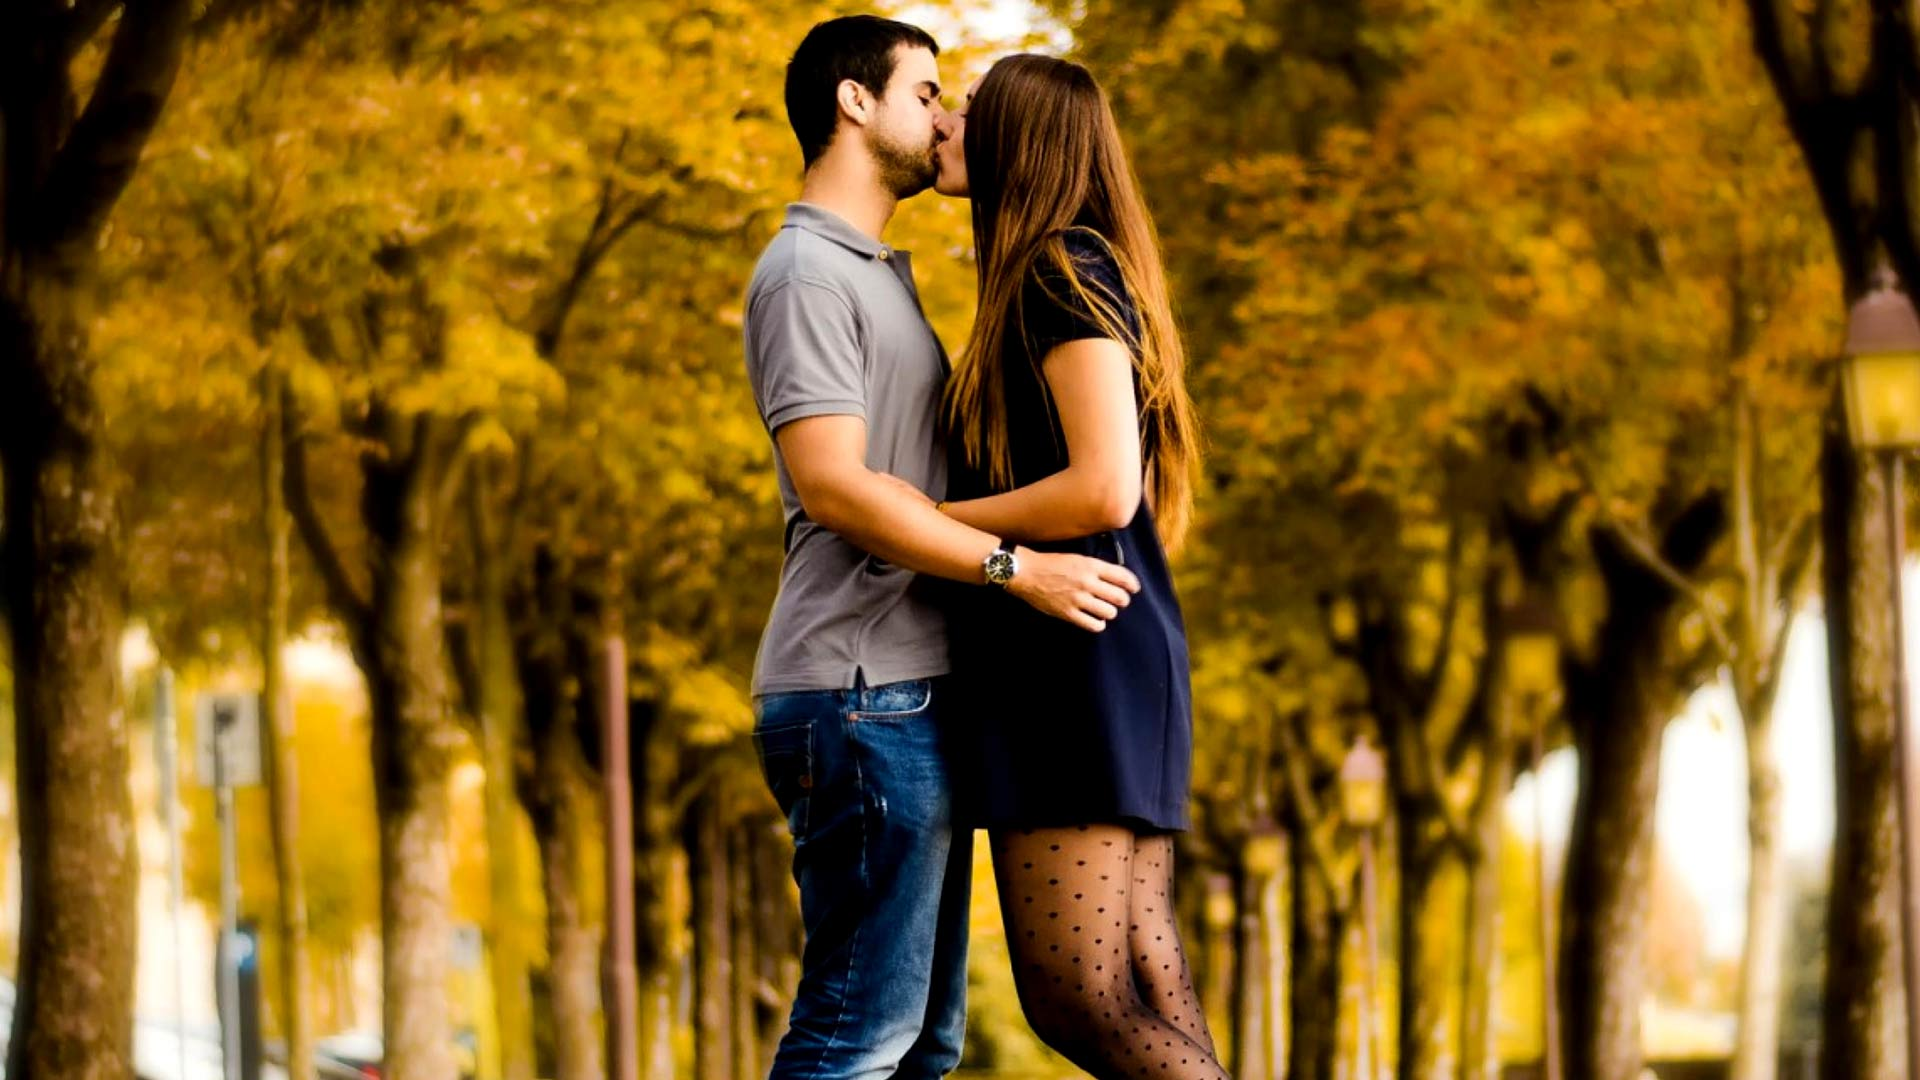 Romantic Love Kiss Images Download